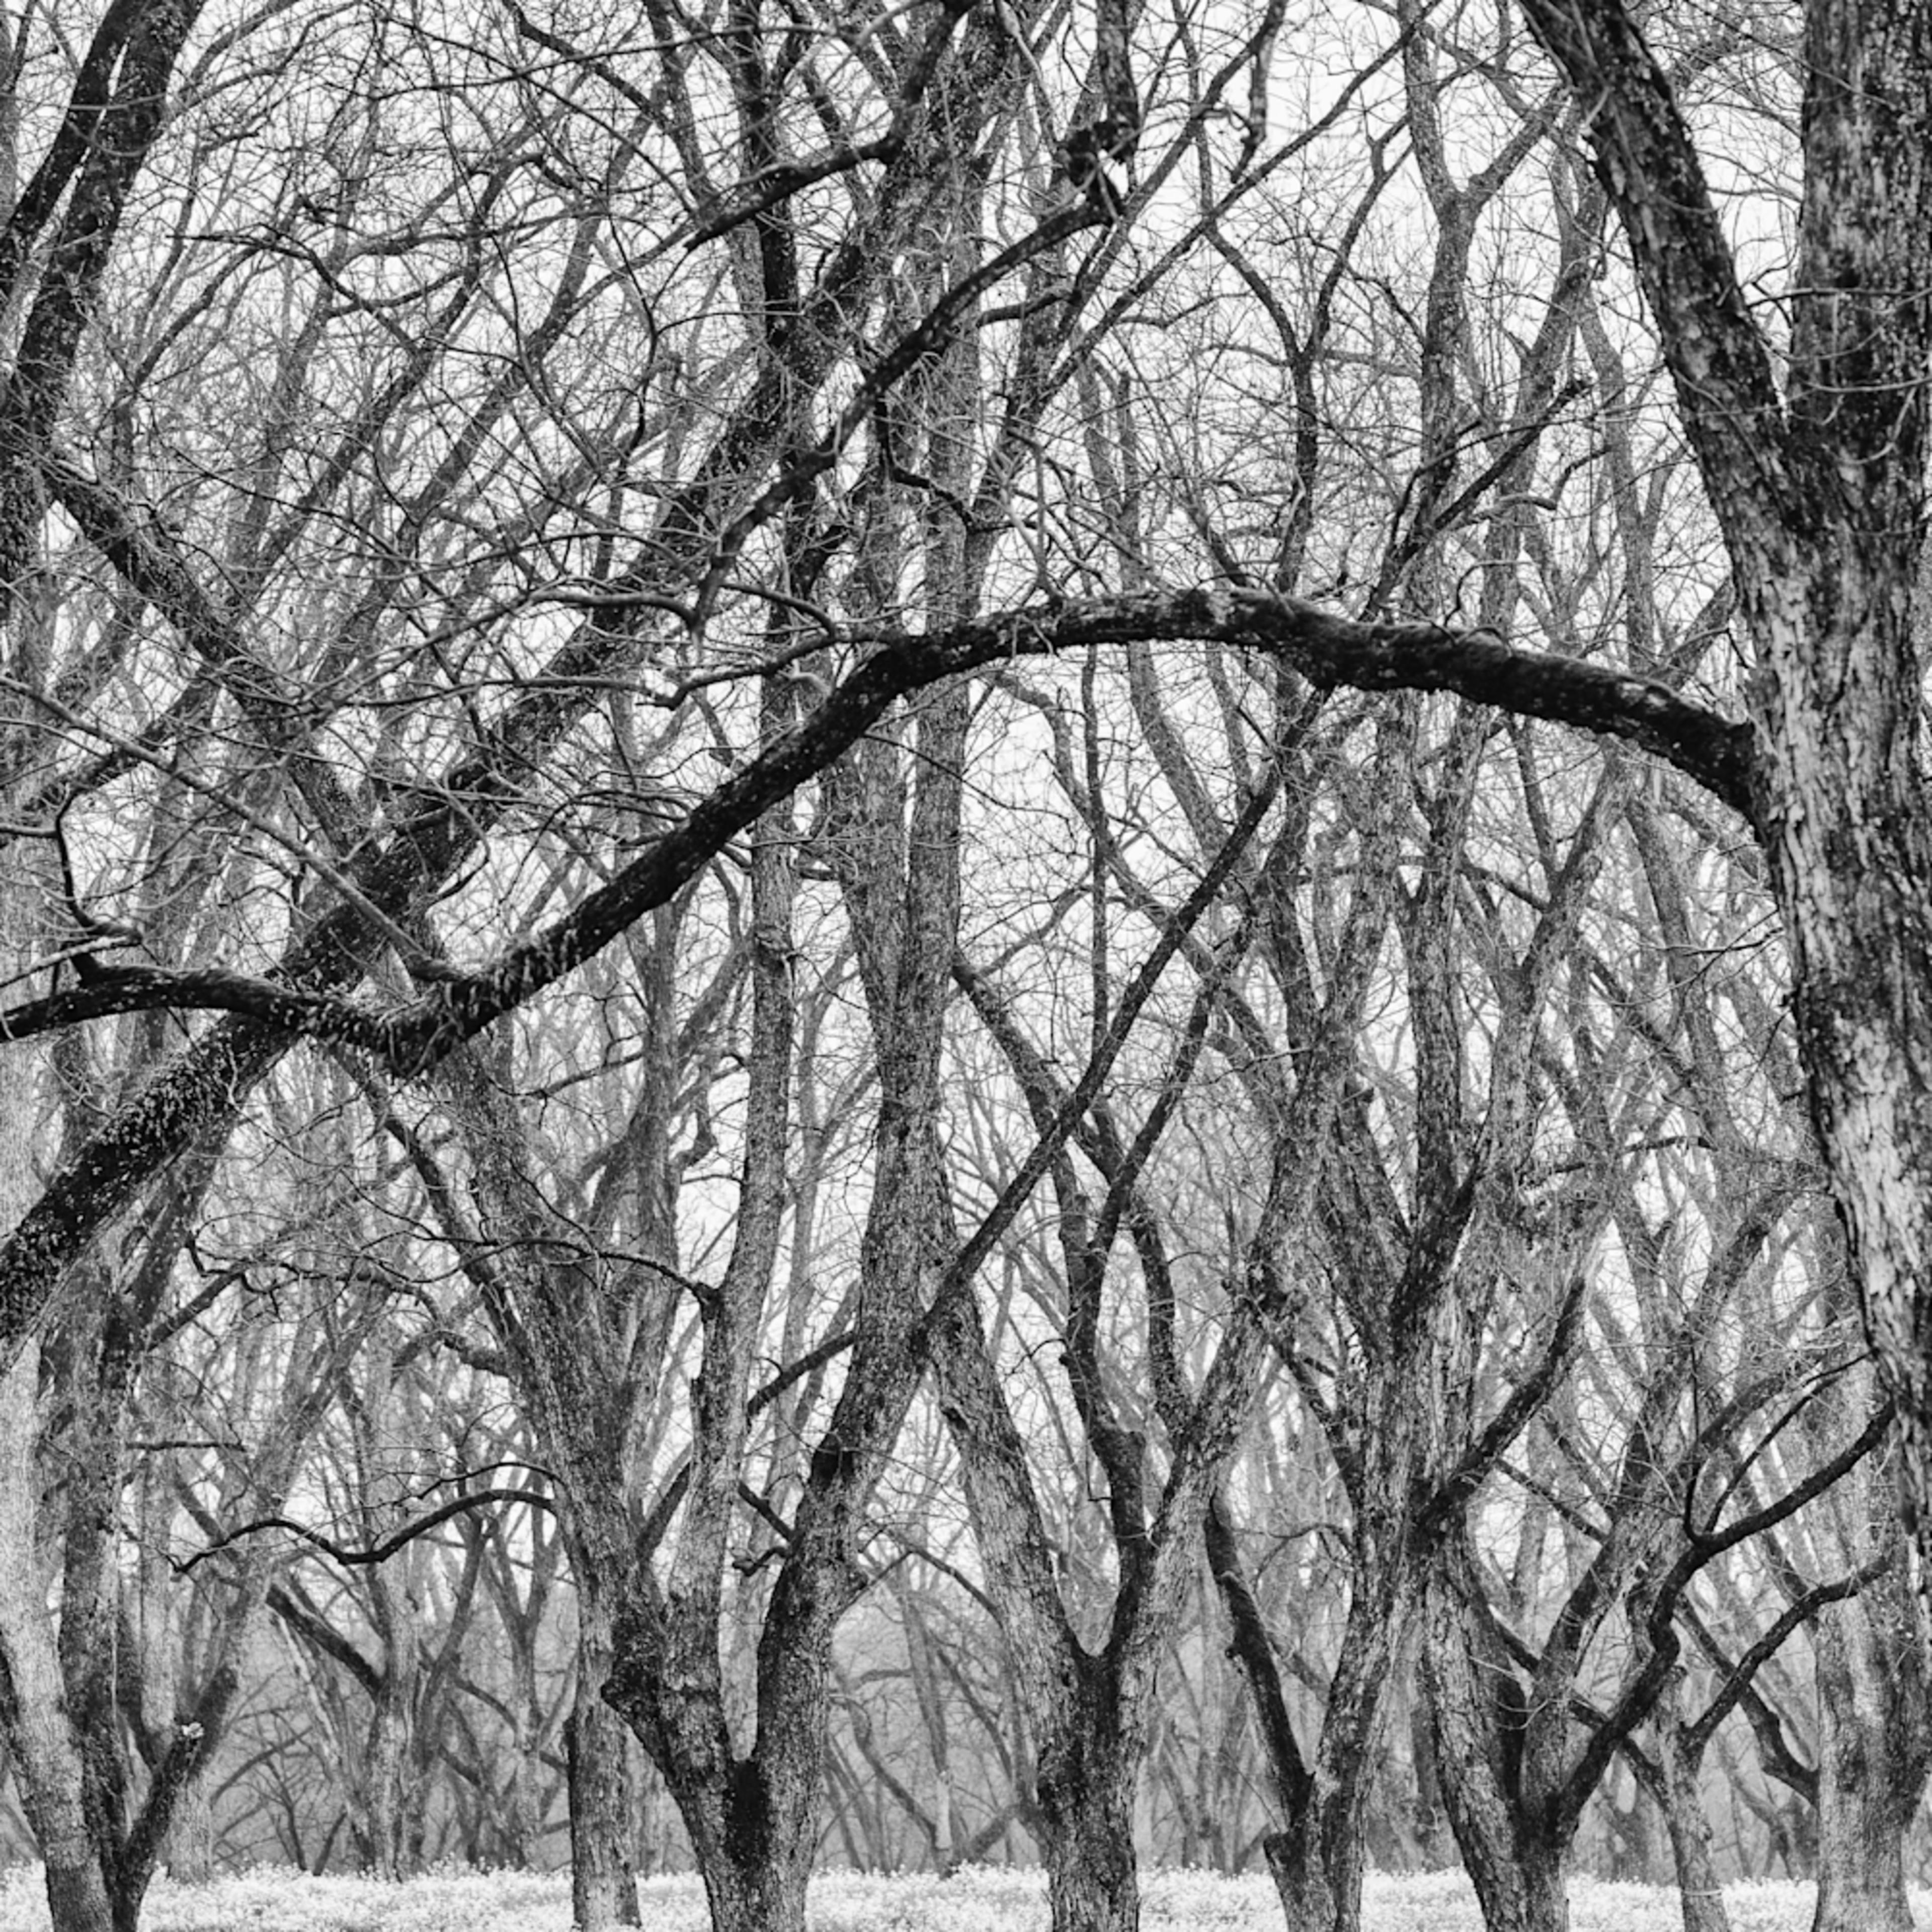 Trees  49 sppoak